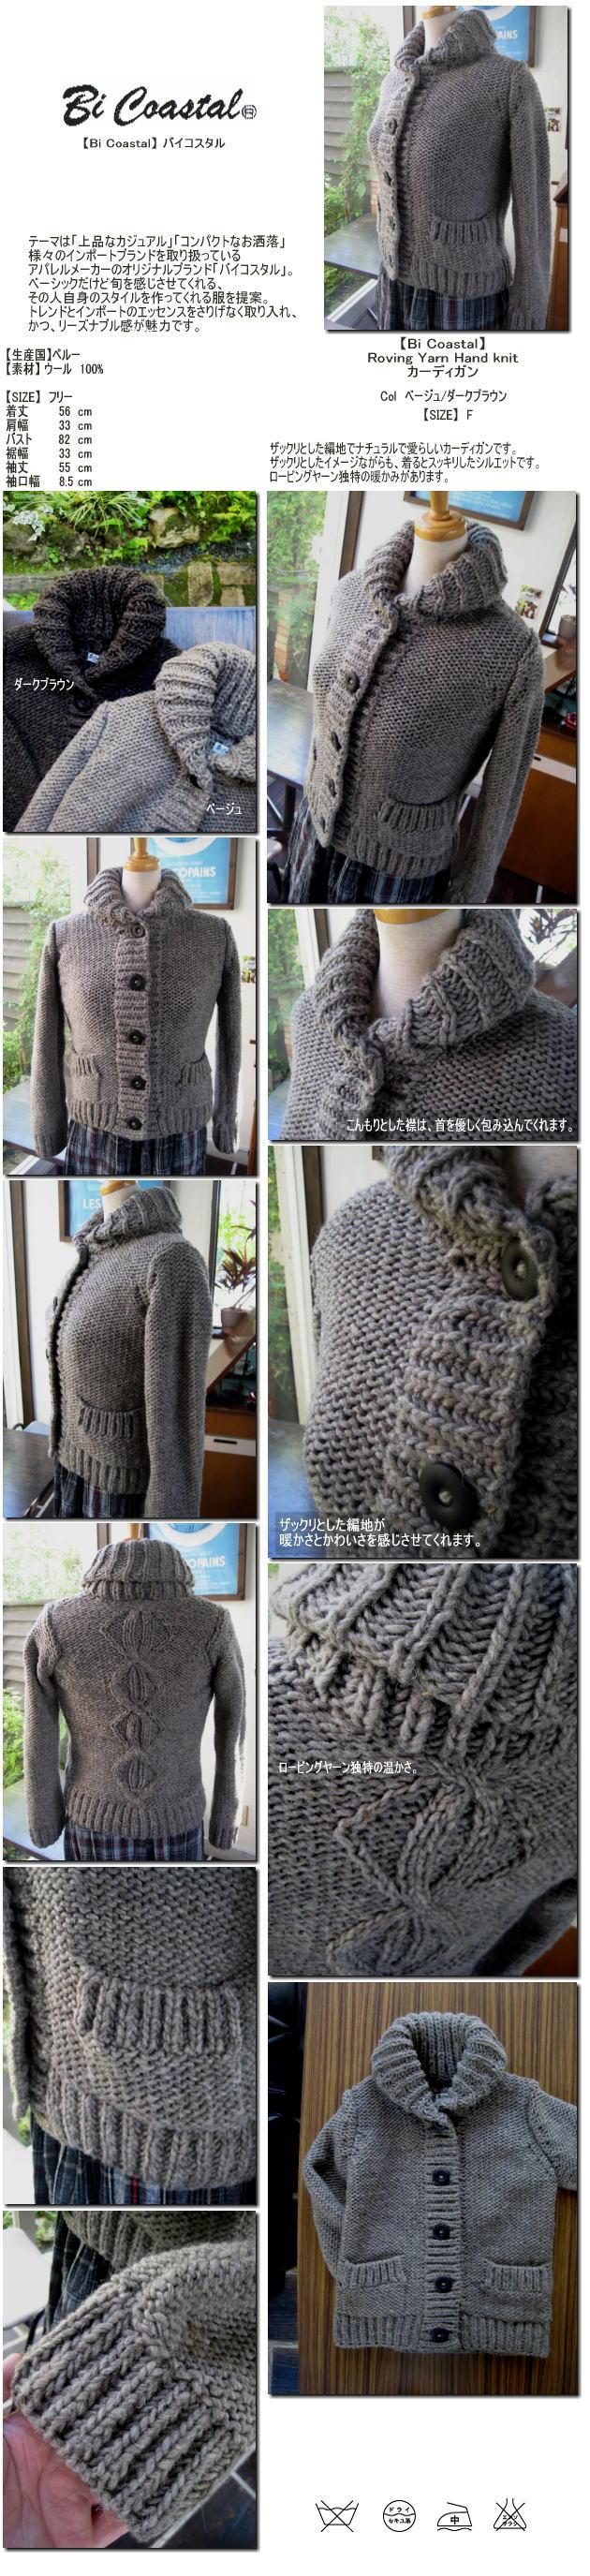 【Bi Coastal】 Roving Yarn Hand knit カーディガン  Col ベージュ/ダークグレー   size F